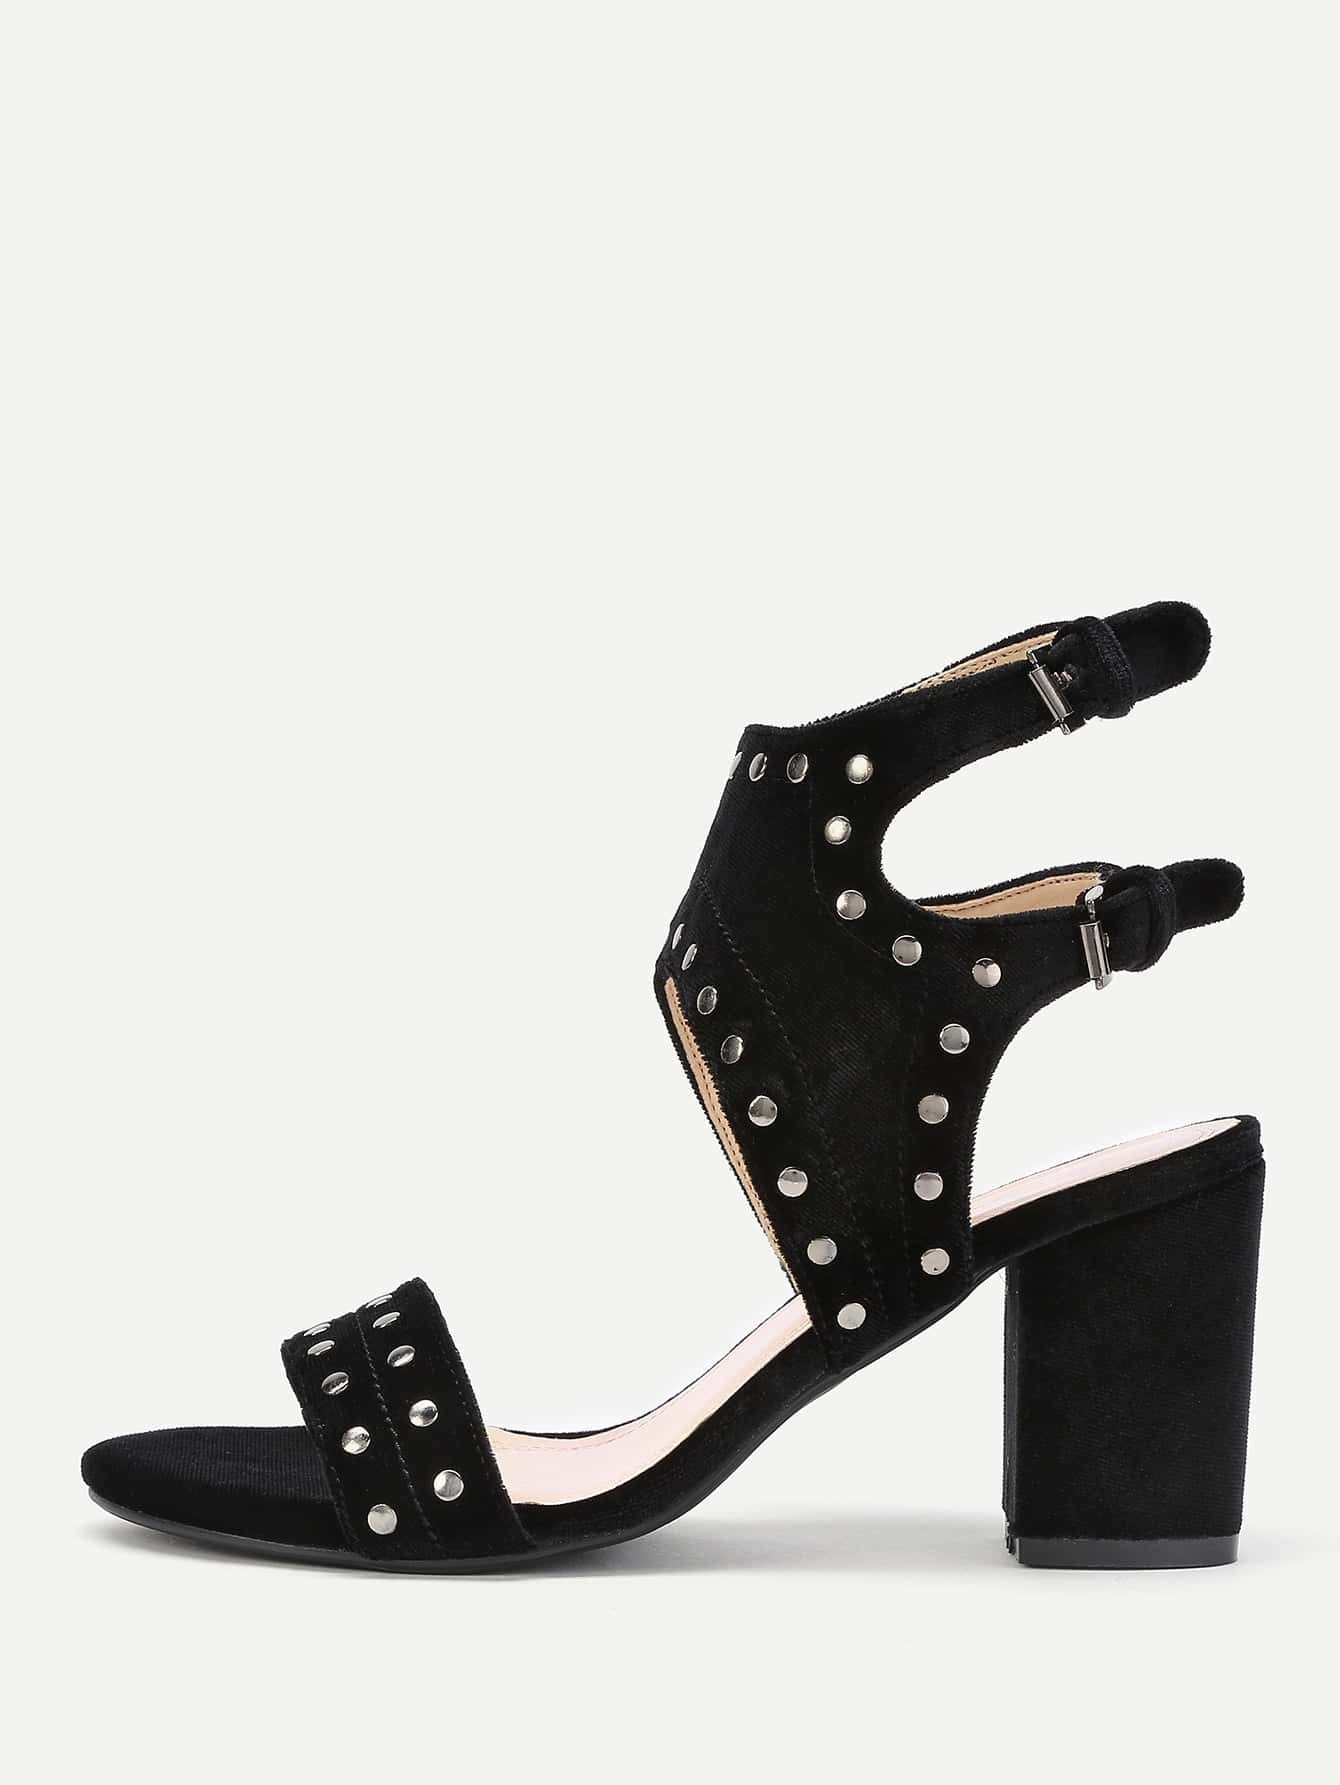 Фото Studded Detail Ankle Cuff Block Heeled Sandals. Купить с доставкой